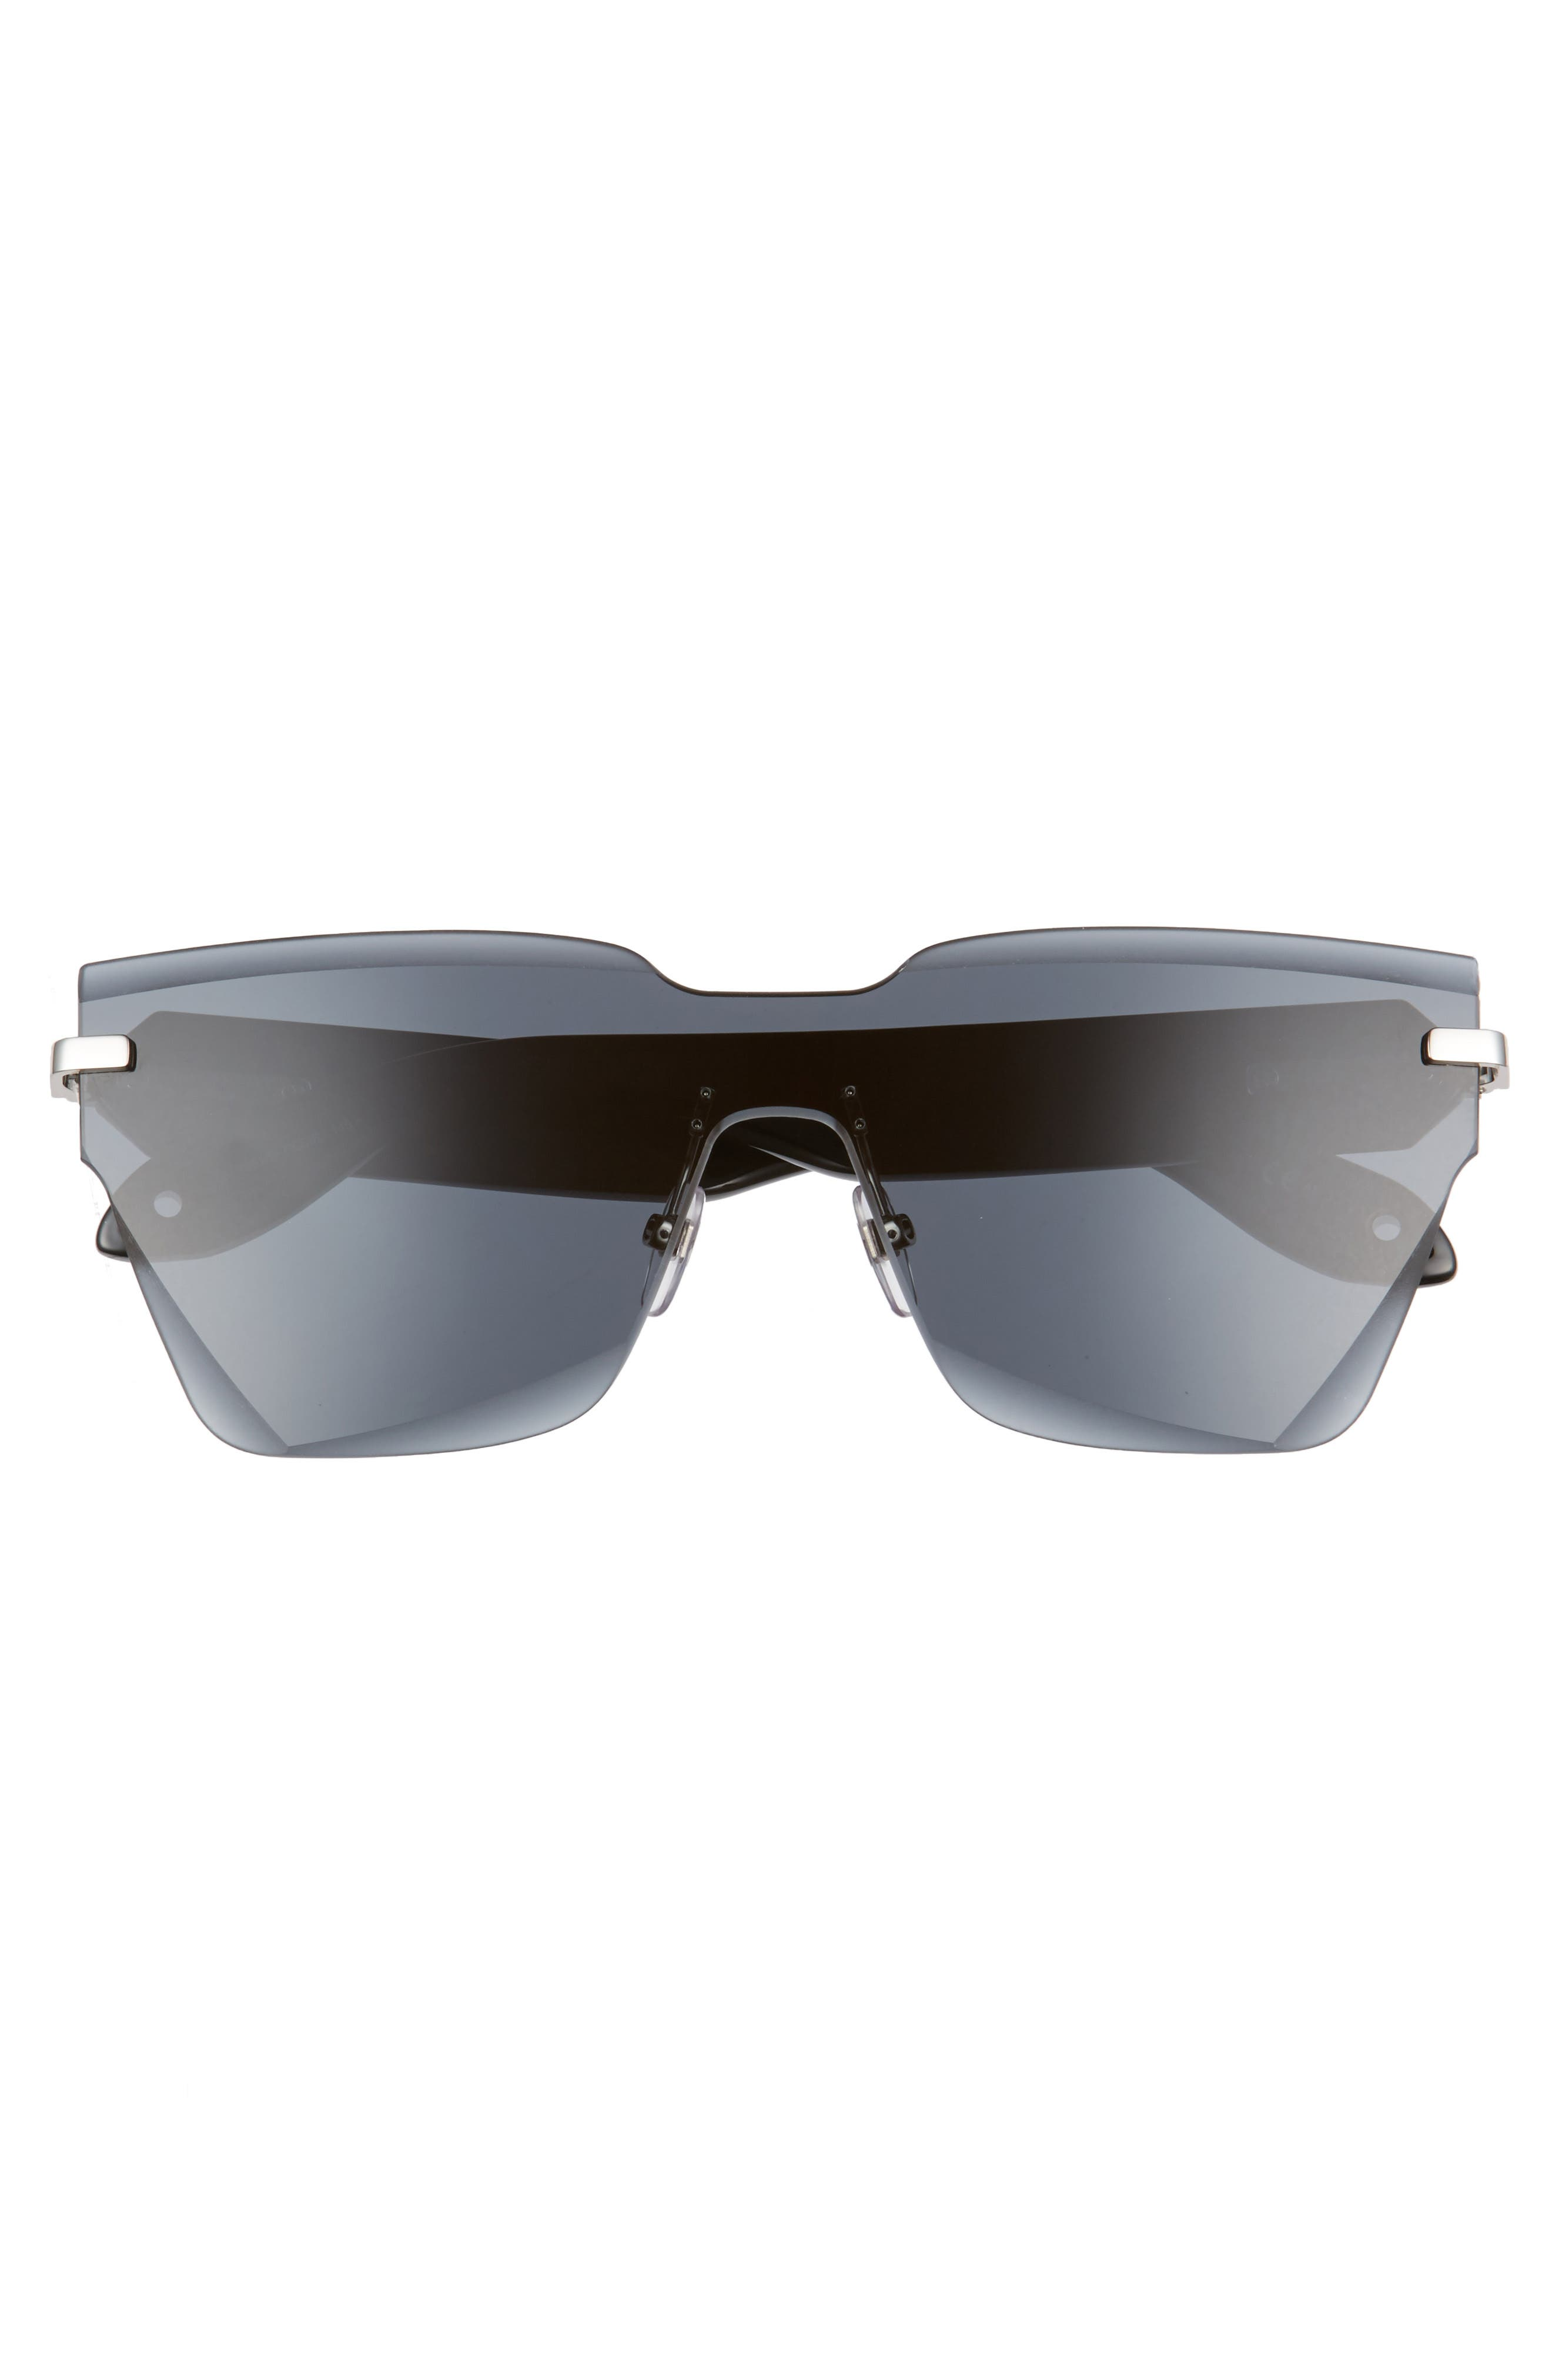 55mm Rimless Shield Sunglasses,                             Alternate thumbnail 3, color,                             GREY BLACK